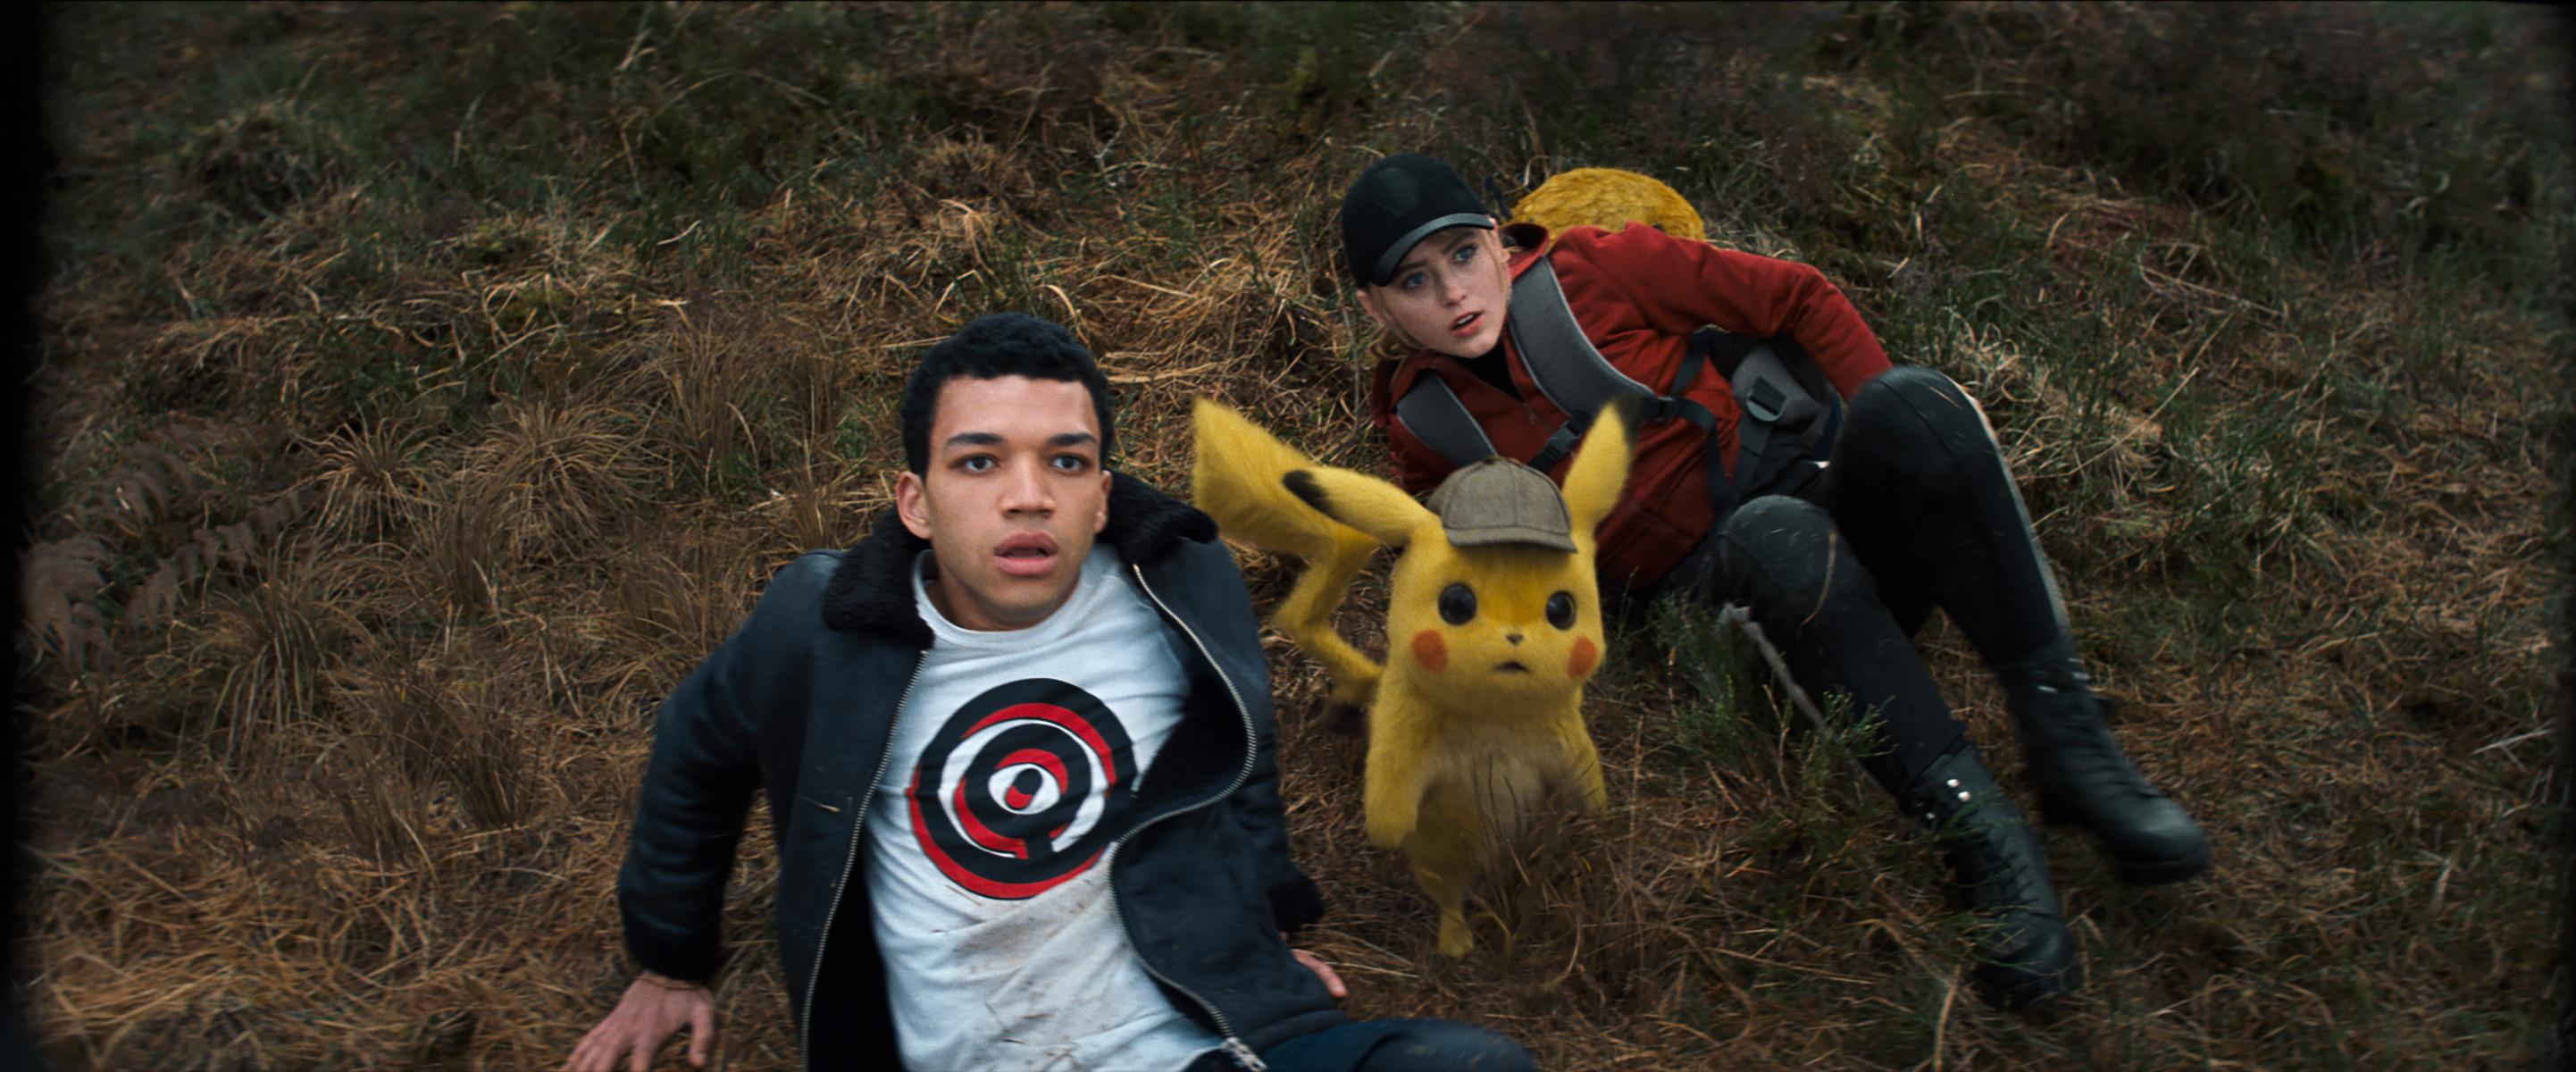 Ryan Reynolds, Kathryn Newton, and Justice Smith in Pokémon: Detective Pikachu (2019)